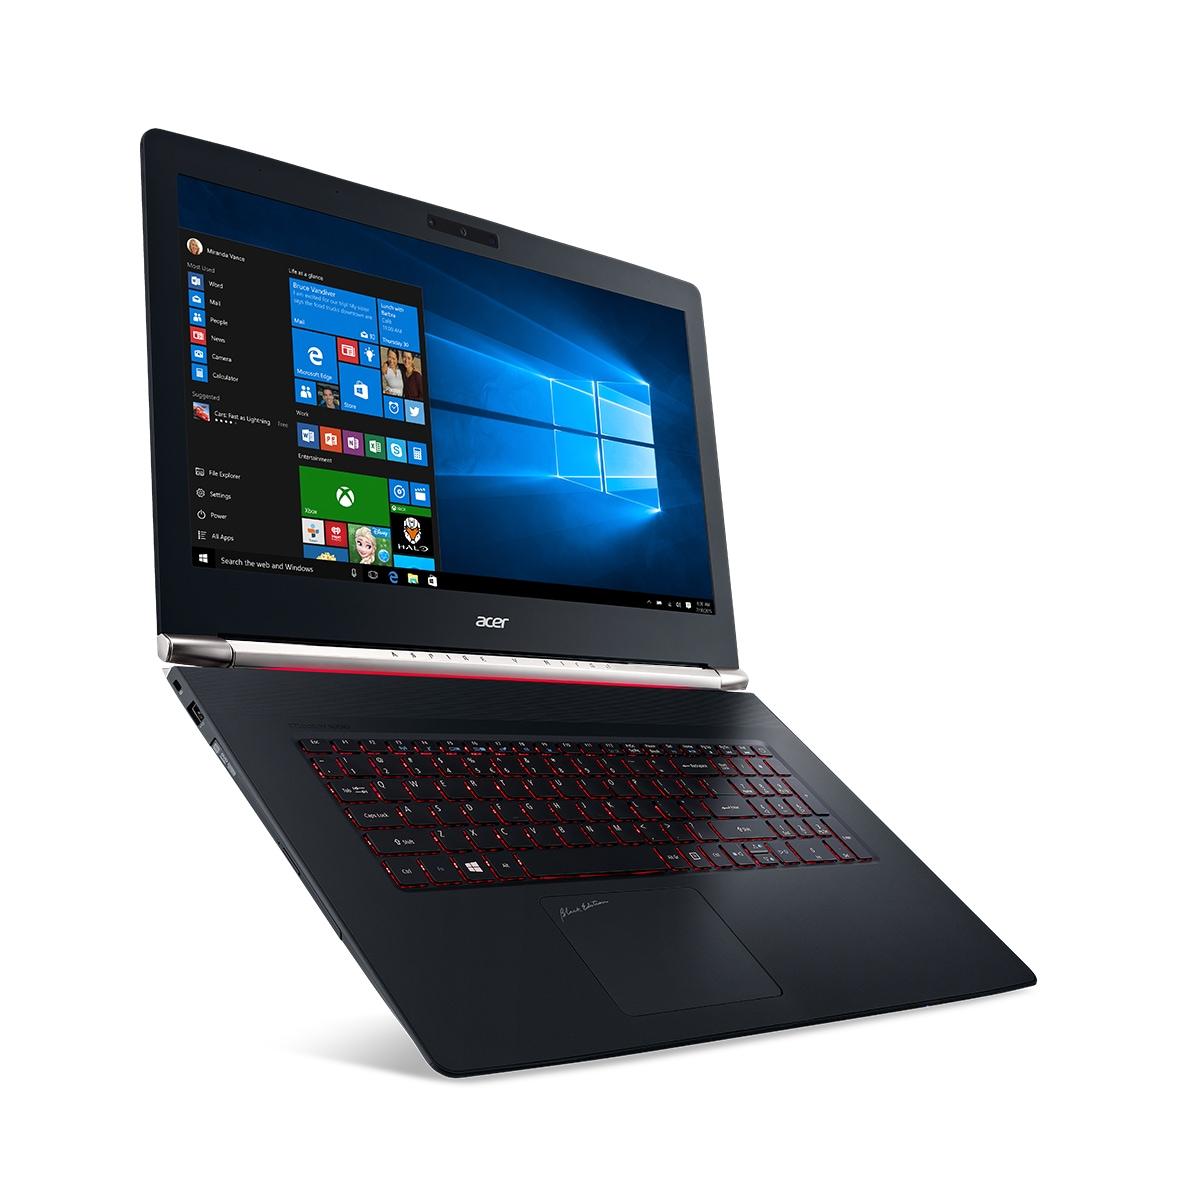 Acer Aspire V Nitro Intel RealSense_8